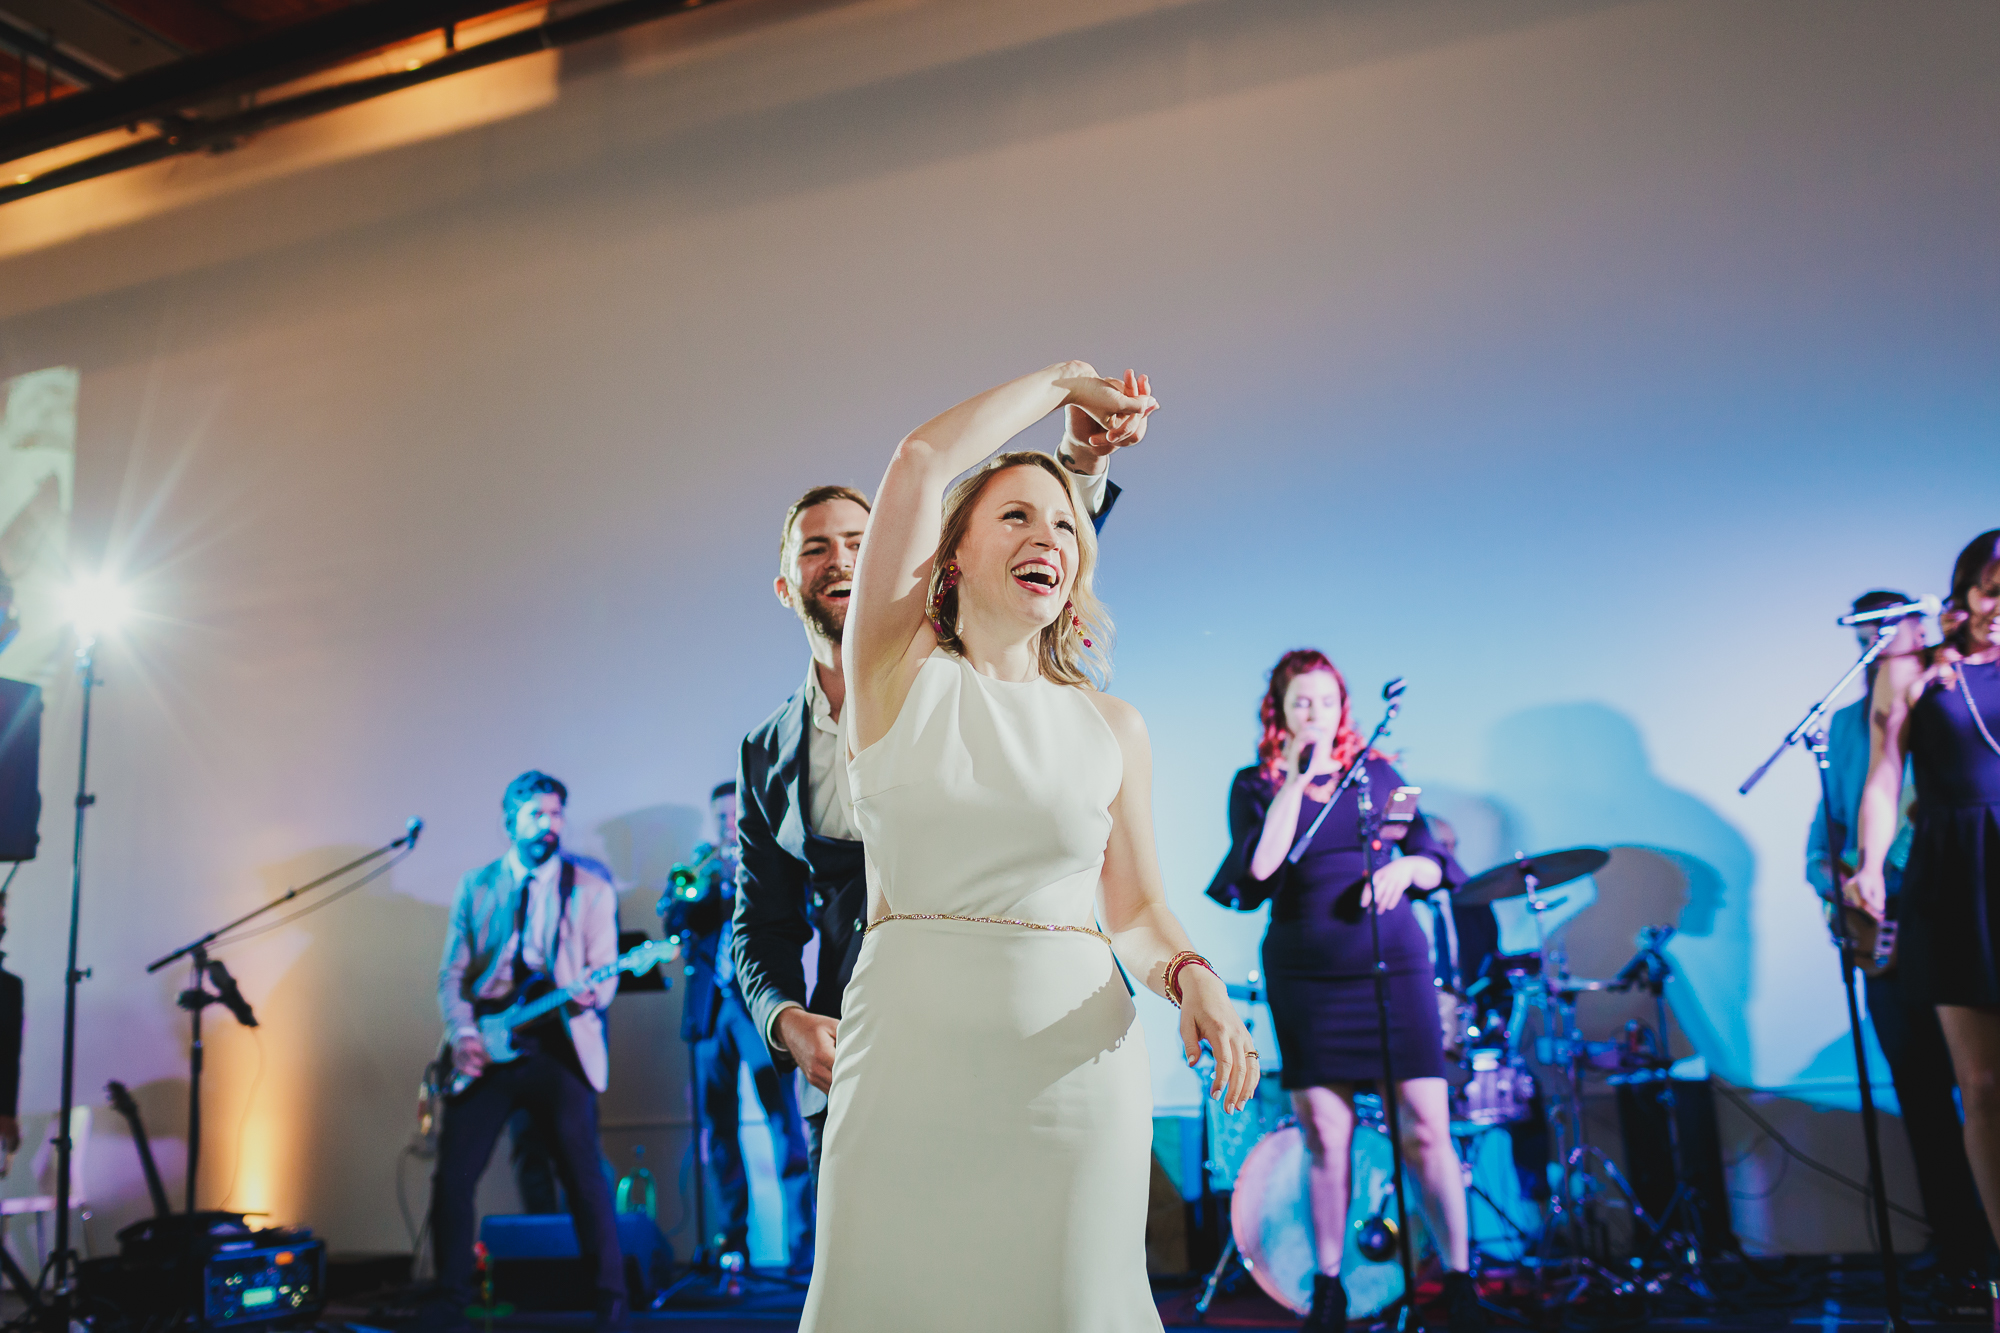 canvas event space wedding photos by Krista Welch-0096.jpg